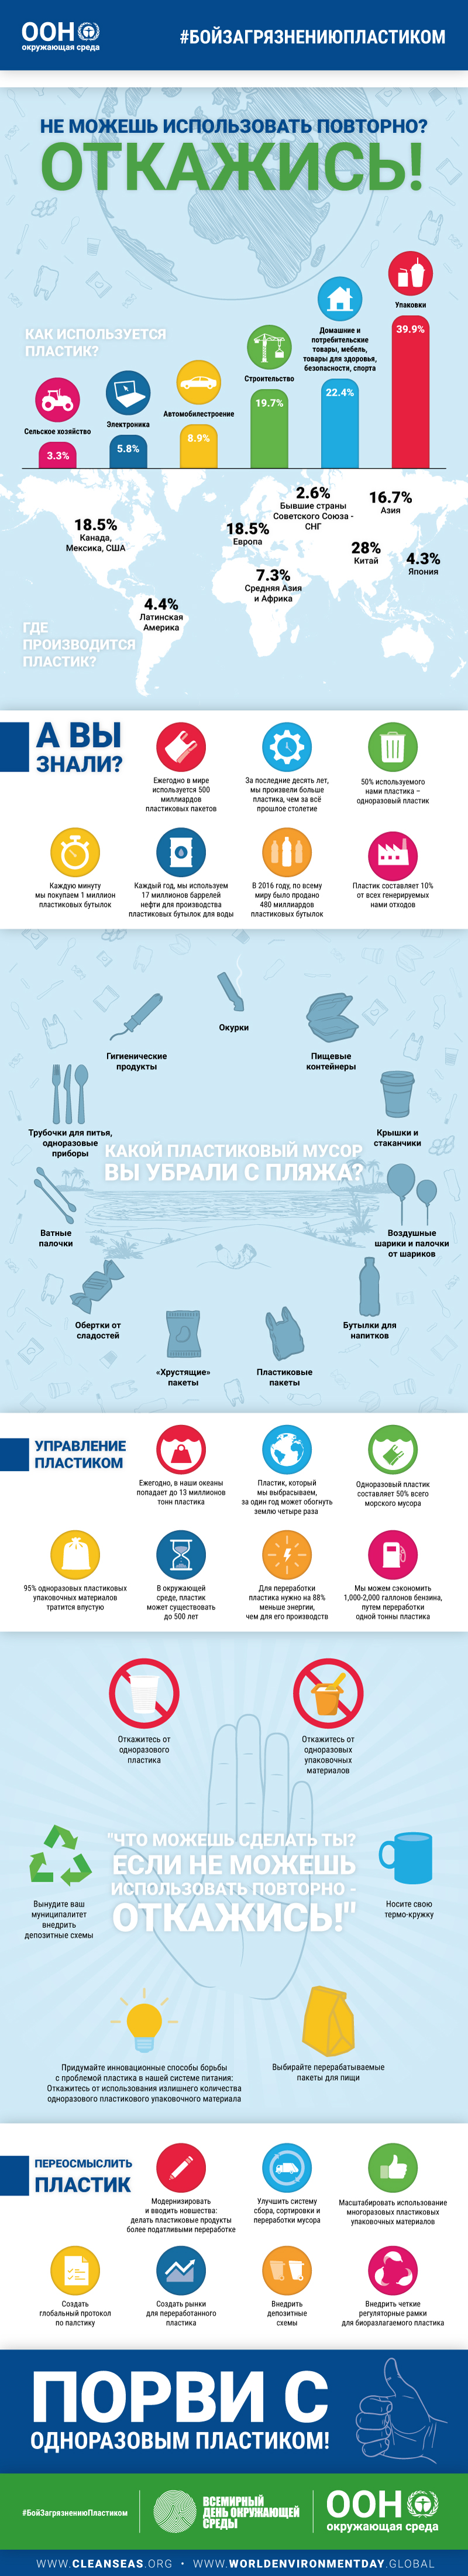 RU_PLASTIC_infographic.jpg